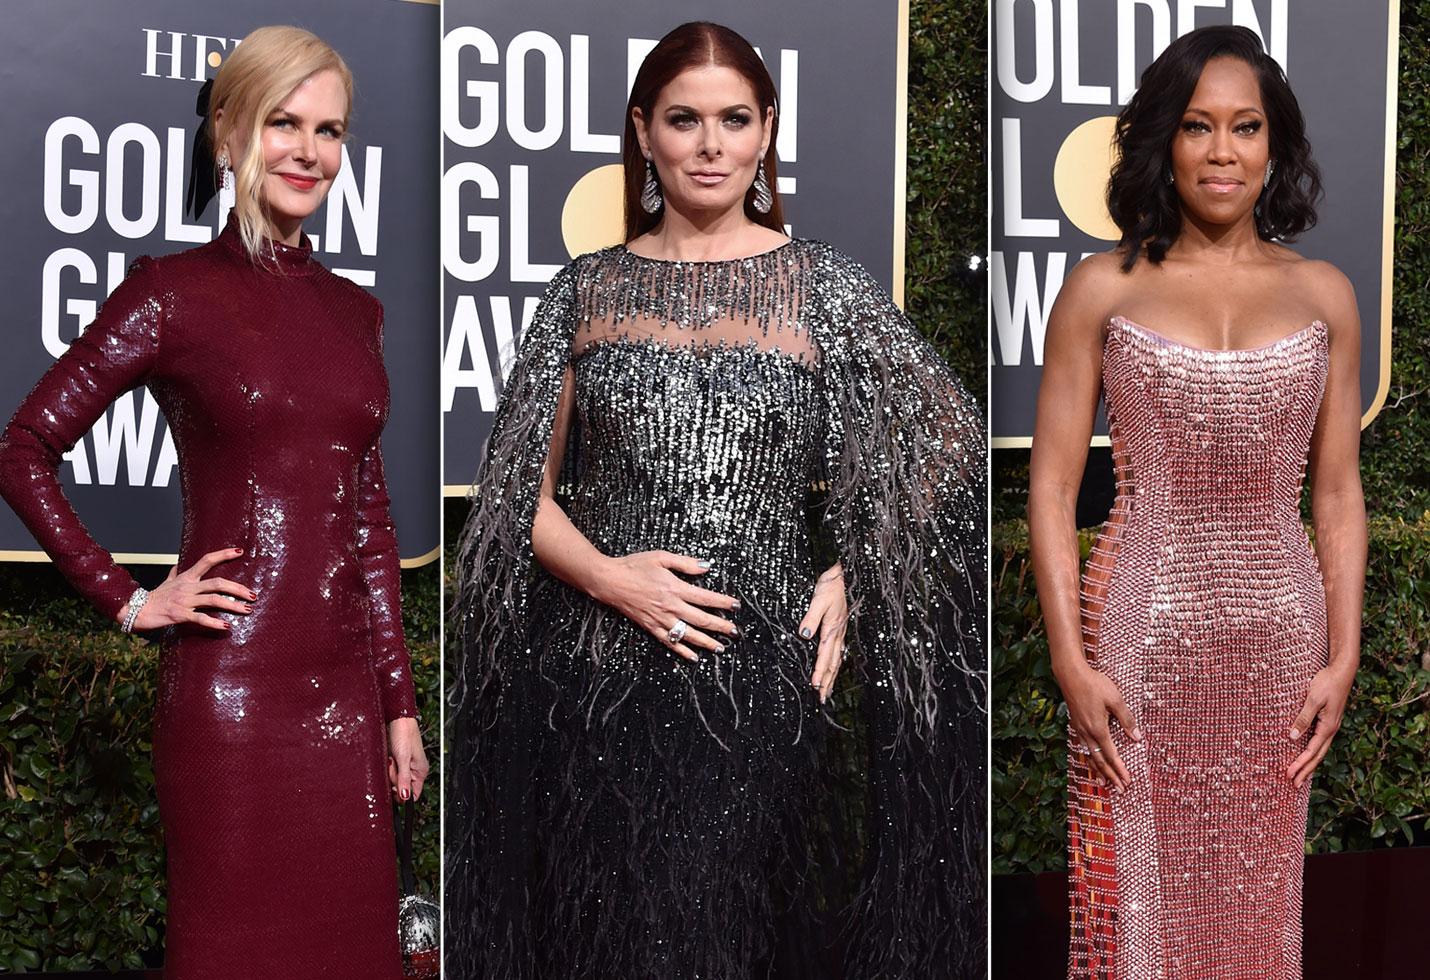 Best Dressed 2019 Golden Globes Red Carpet 2019: The 22 Best Dressed Celebrities